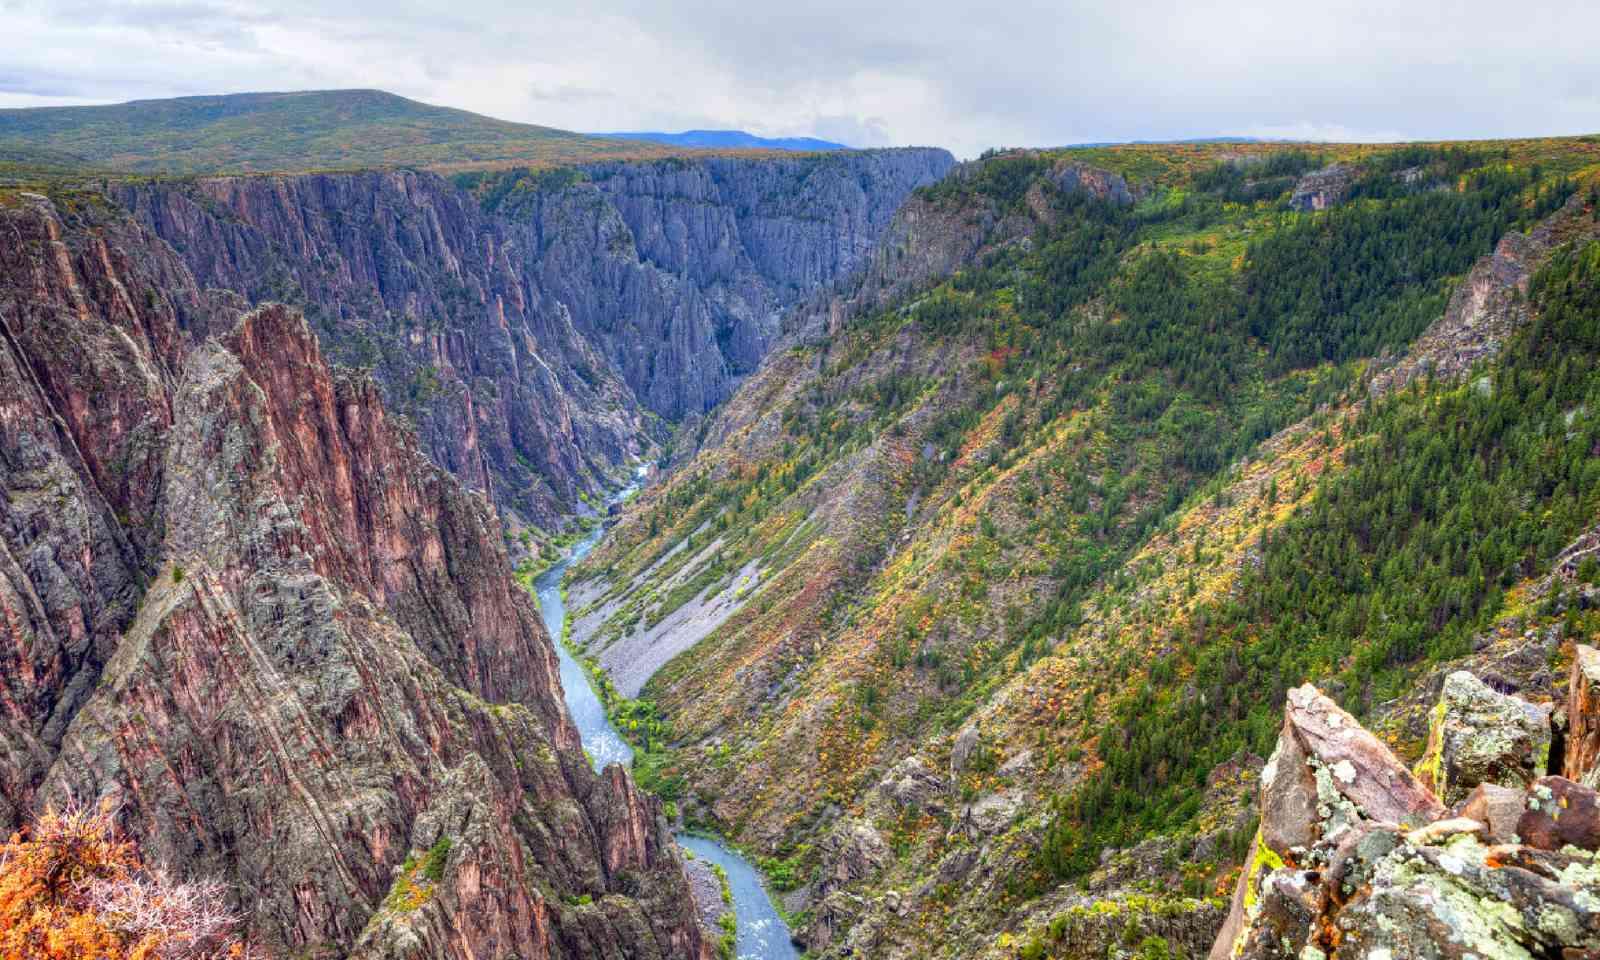 Black Canyon of the Gunnison National Park (Shutterstock)